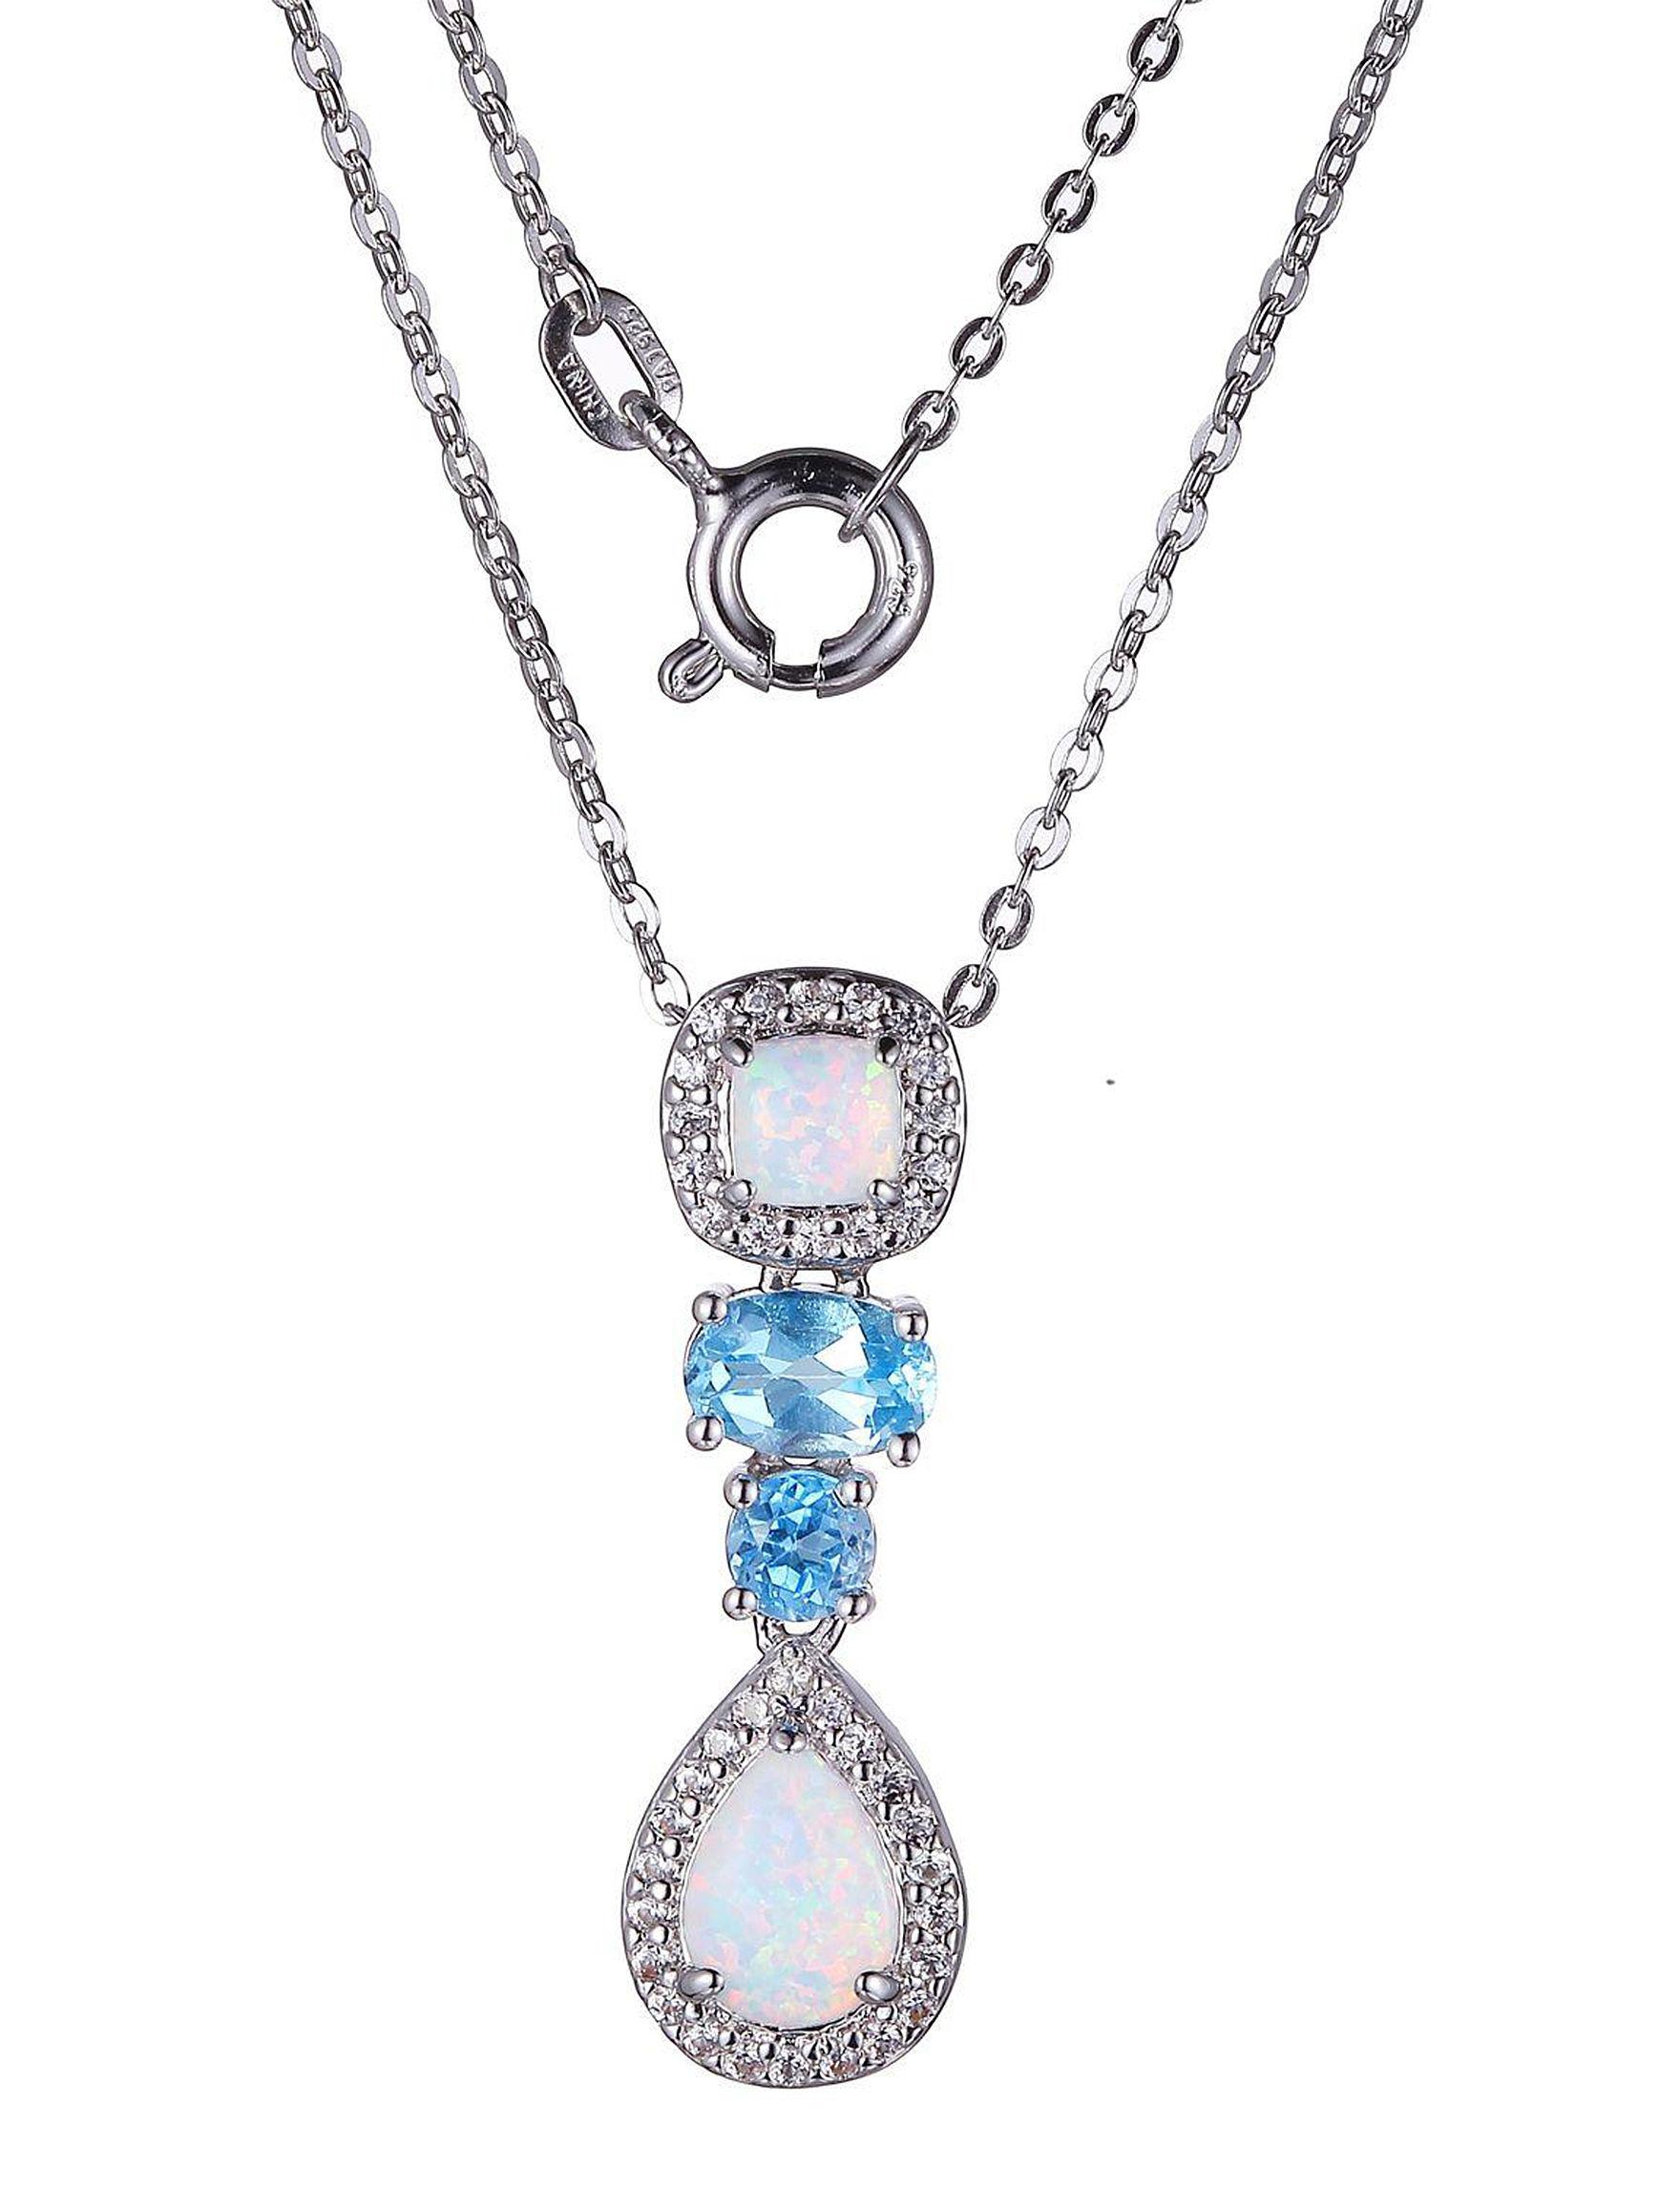 PAJ INC. Silver Necklaces & Pendants Fine Jewelry